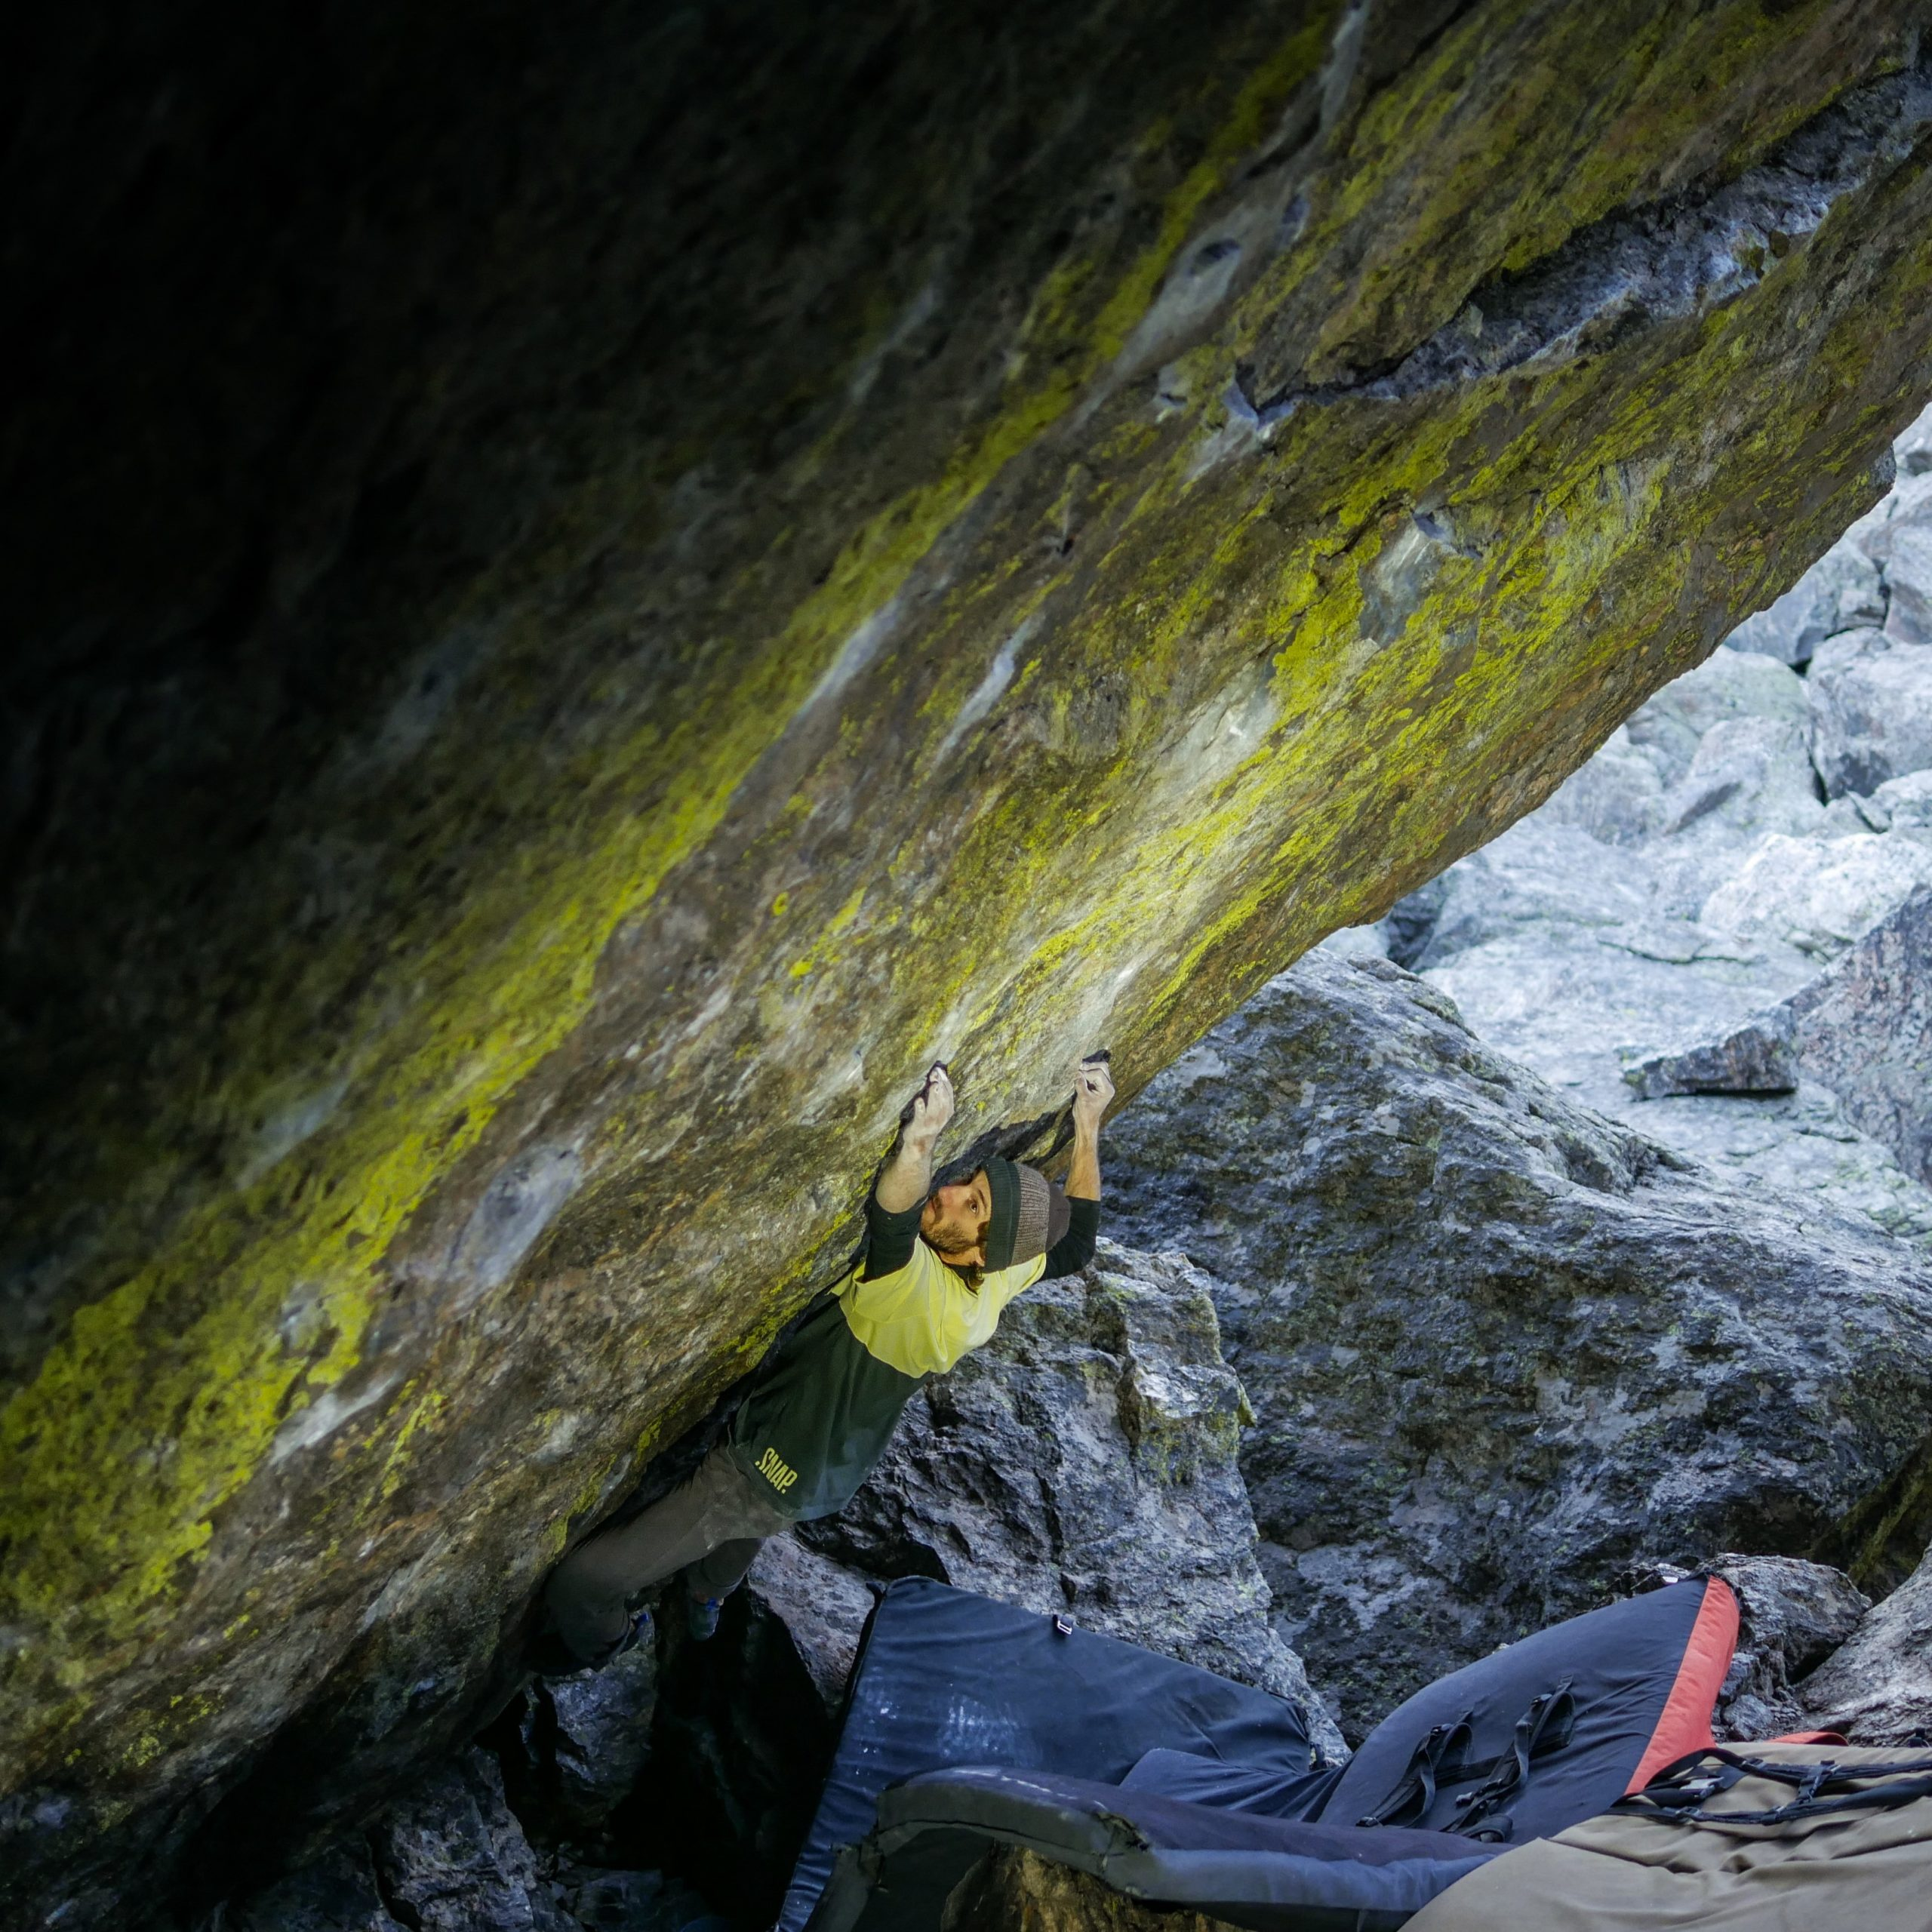 clement lechaptois rocky mountains national park